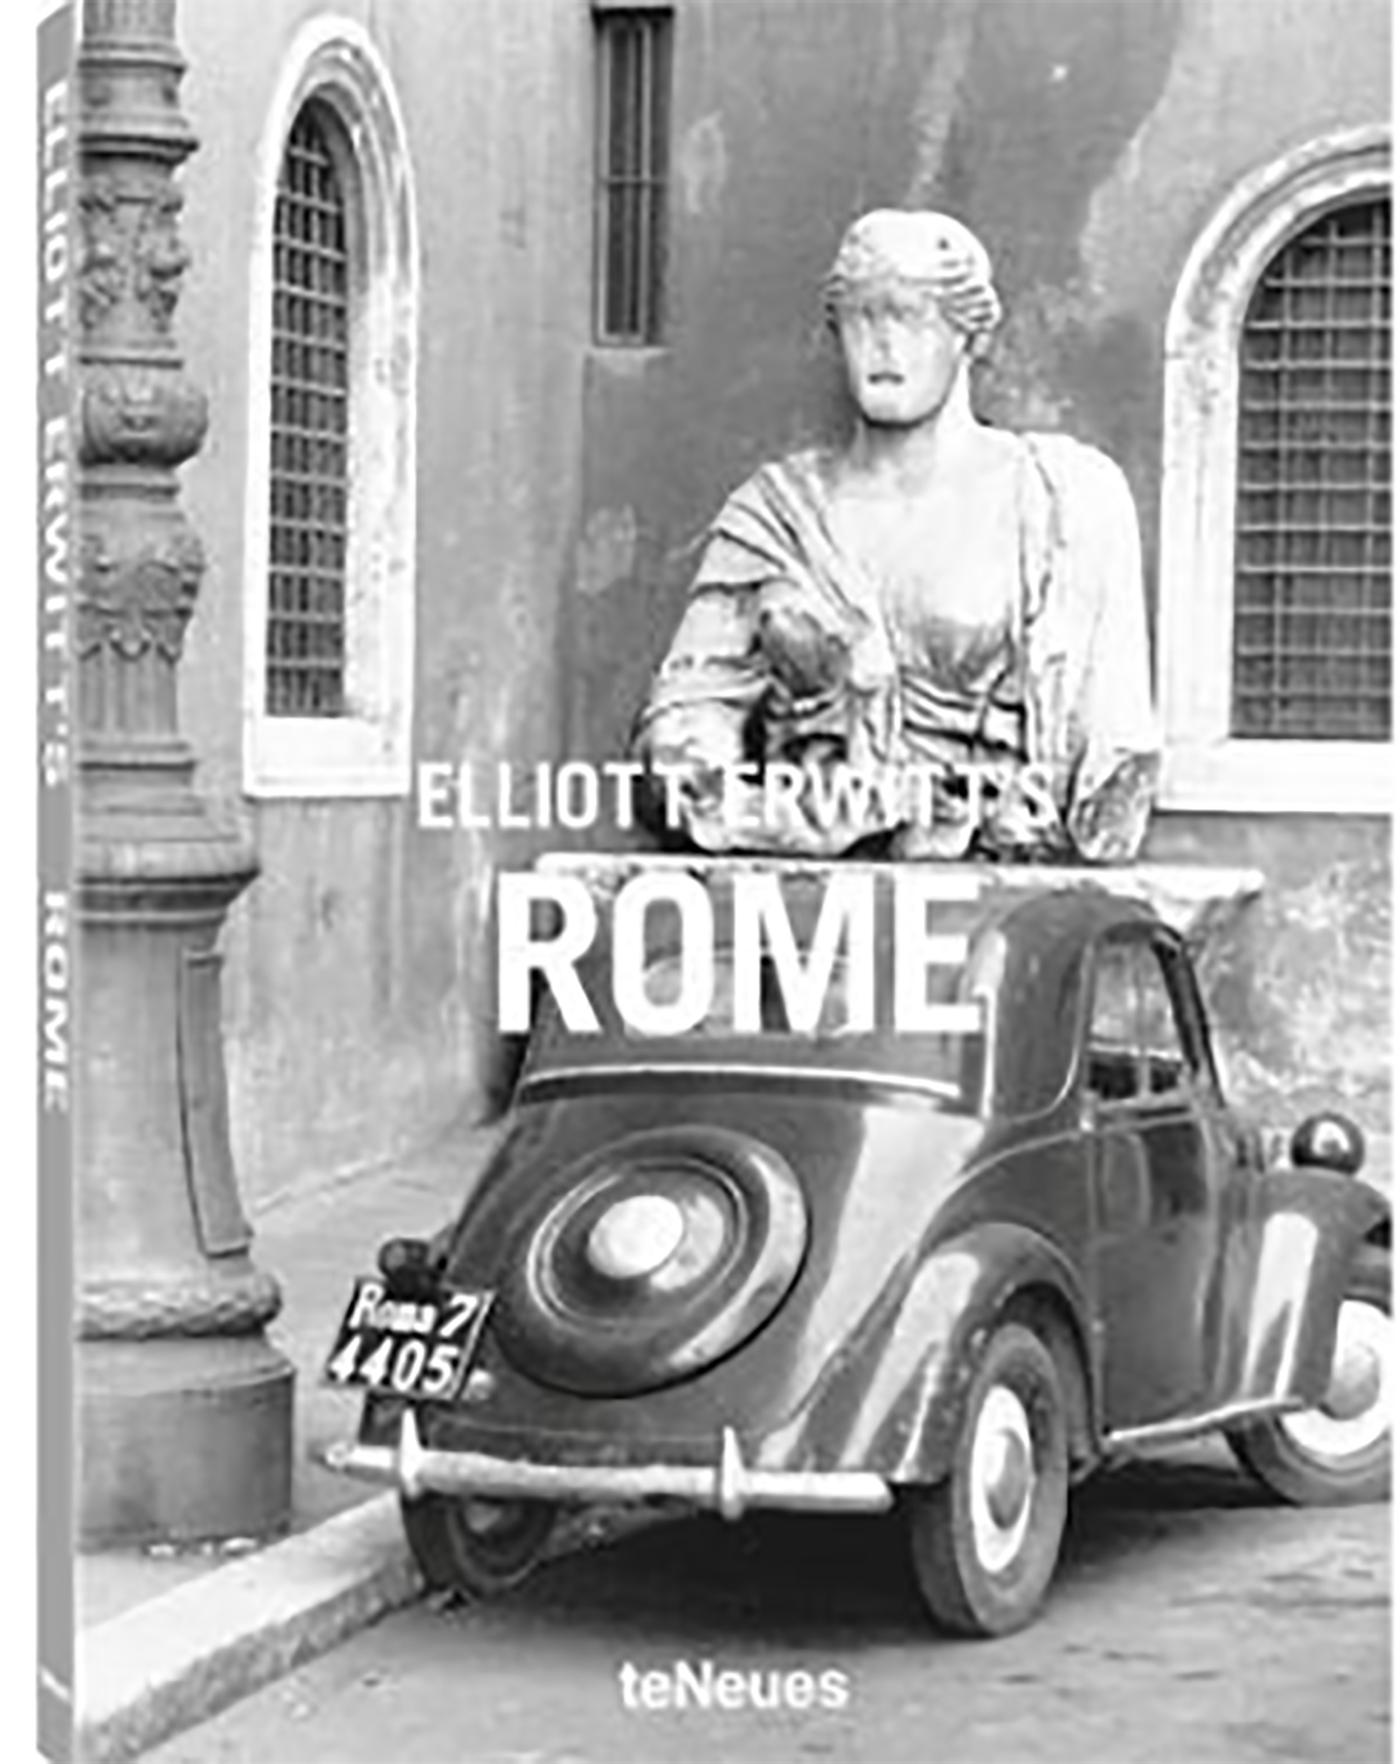 ROME SMALL FLEXICOVER EDITION